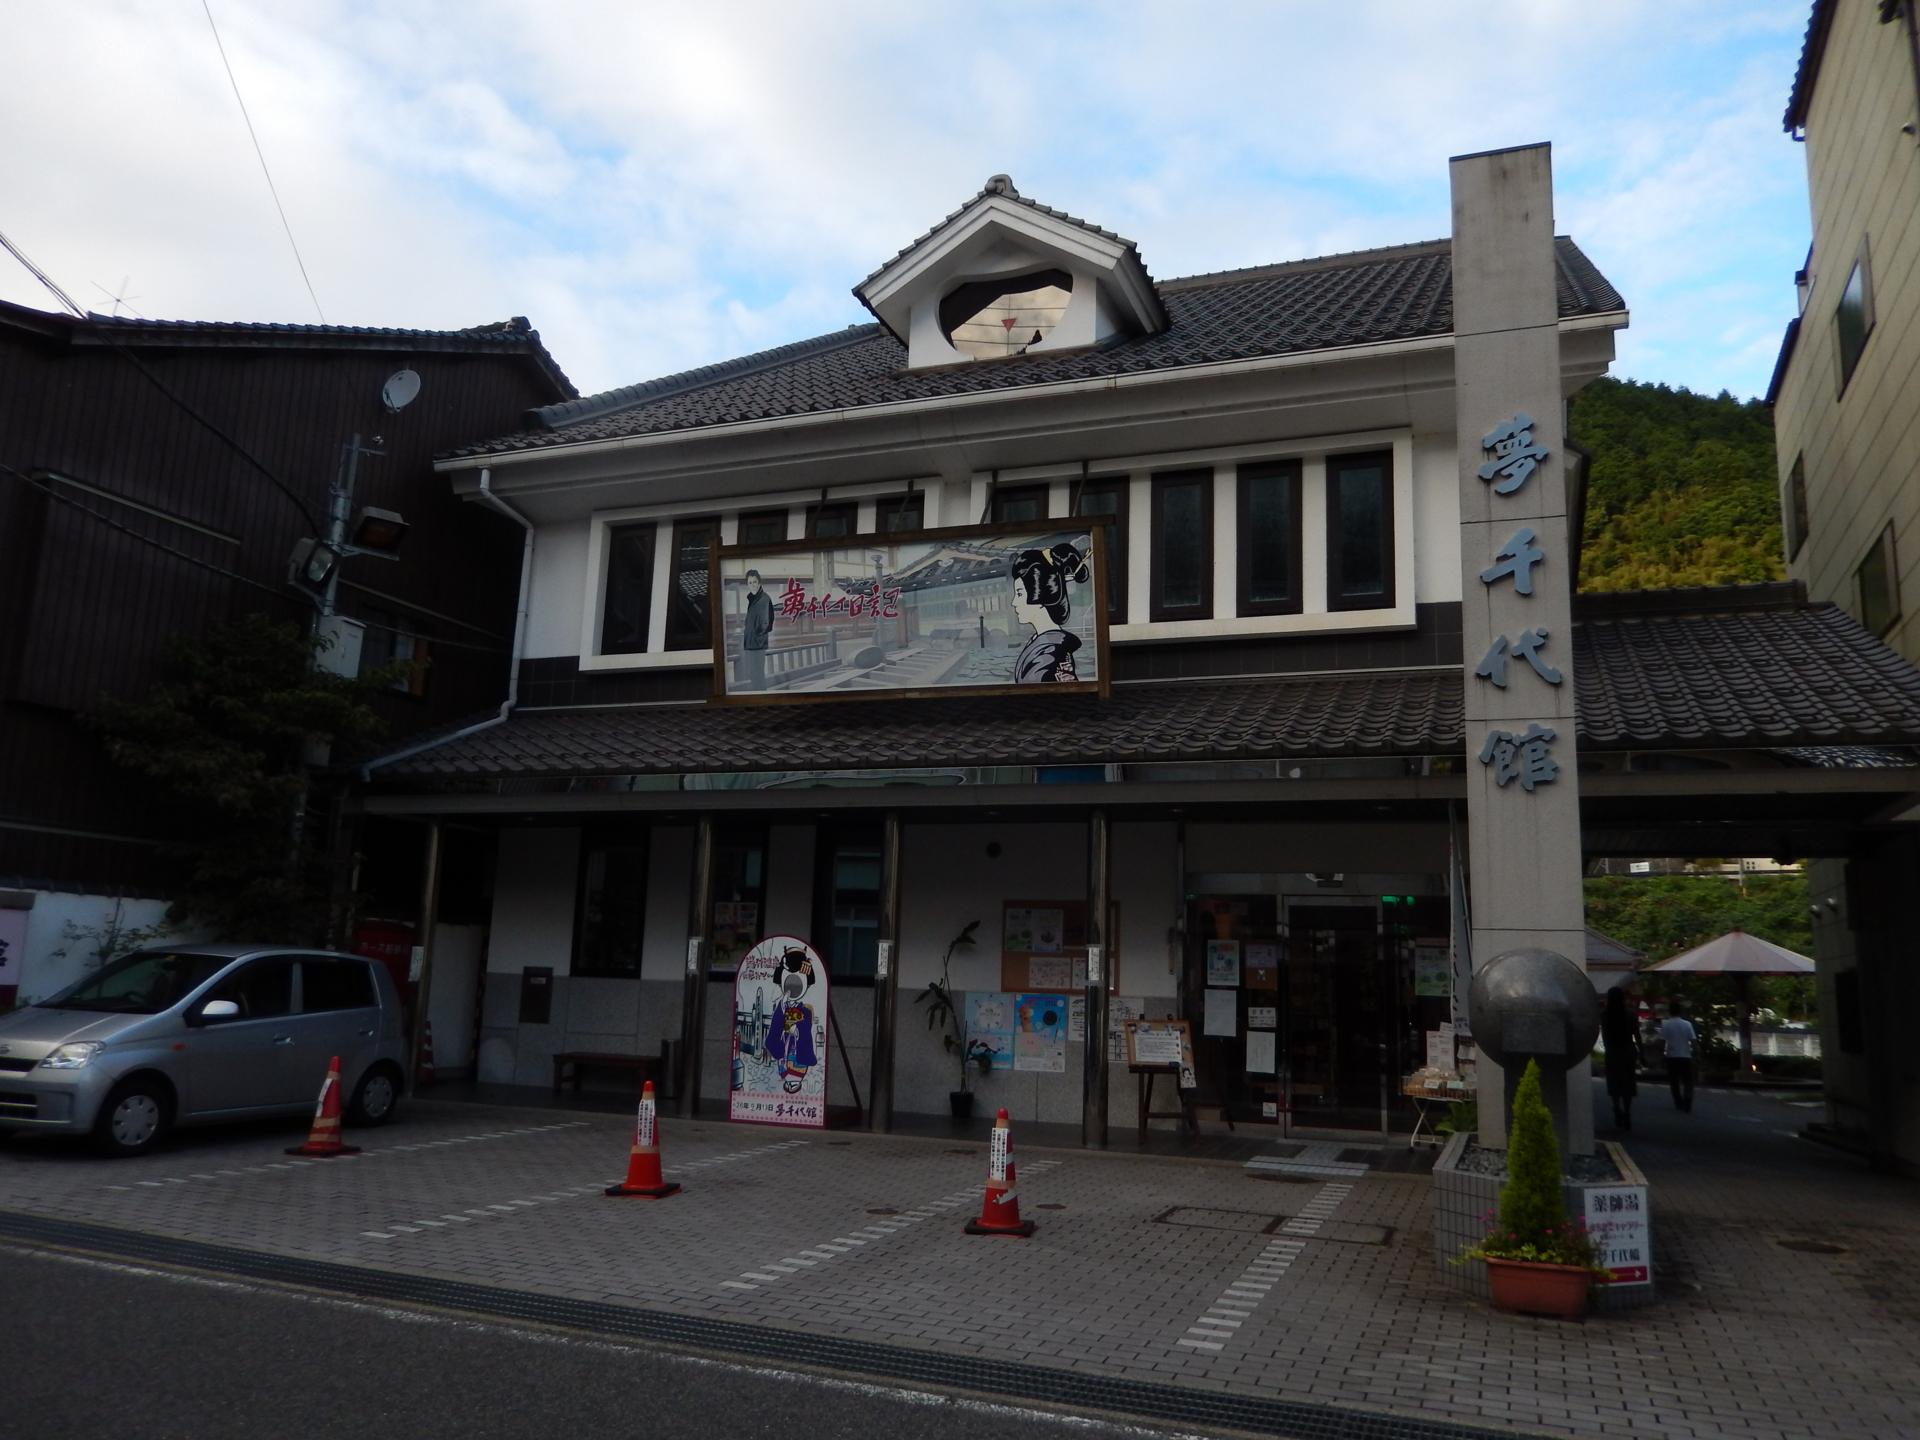 f:id:ToshUeno:20140913171623j:plain